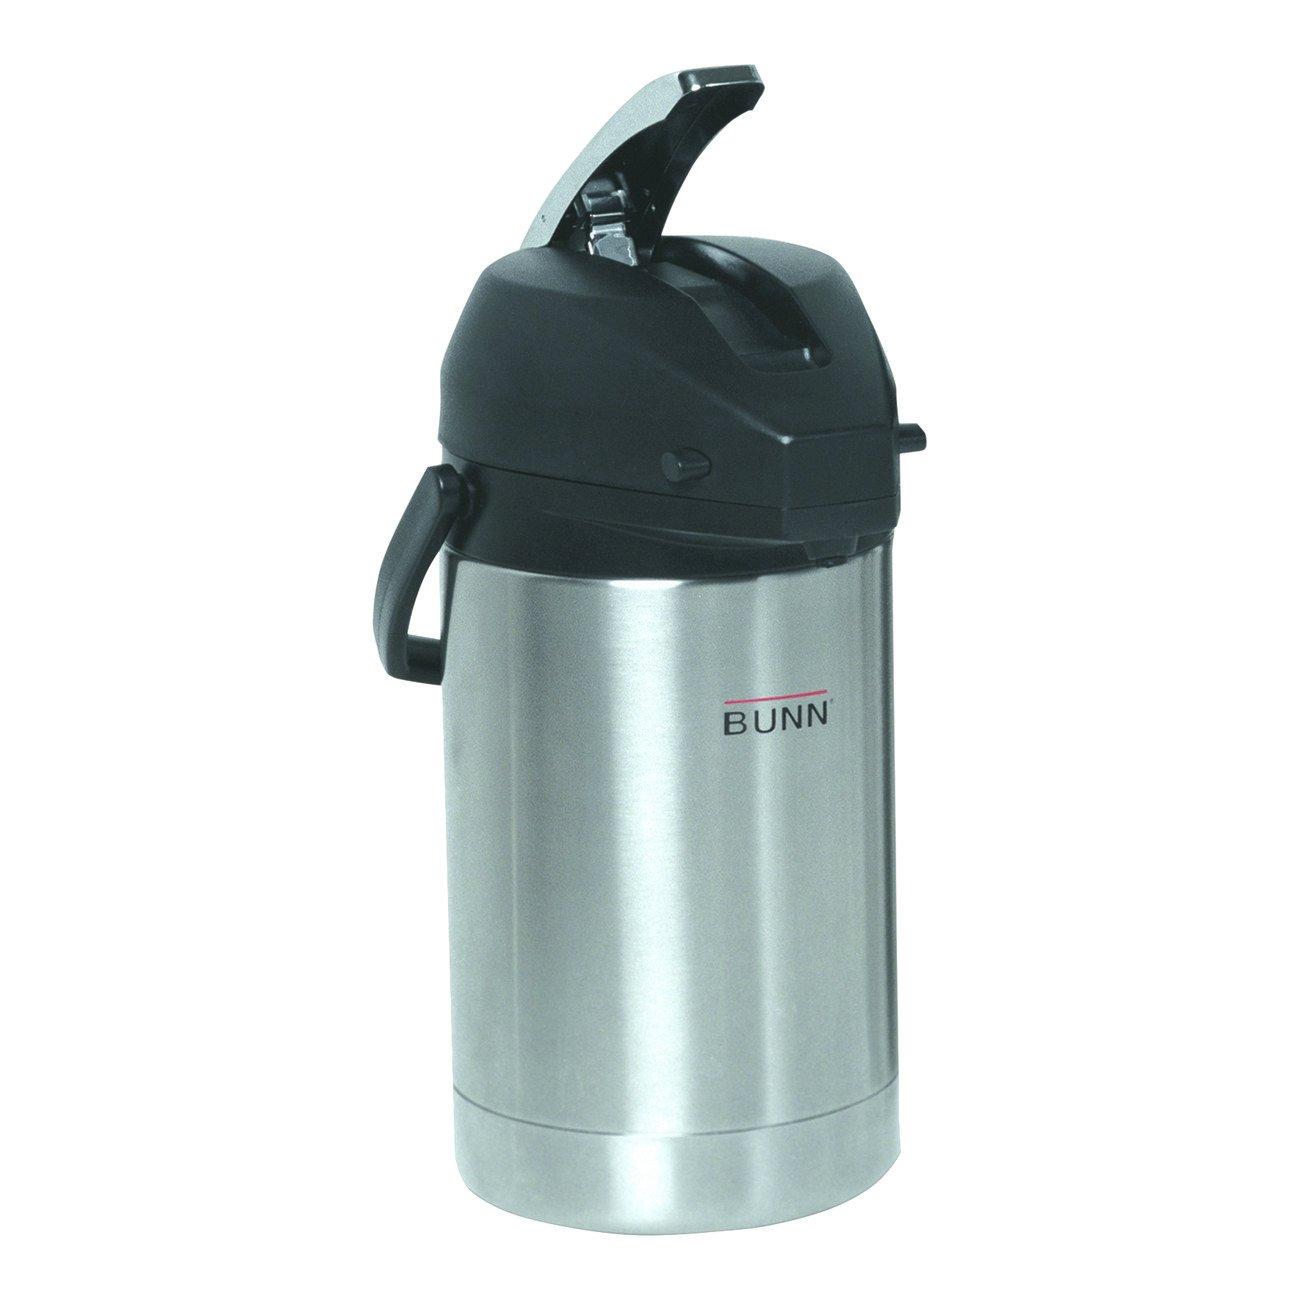 BUNN 32125.0000 2.5 Liter Lever-Action Airpot, Stainless Steel